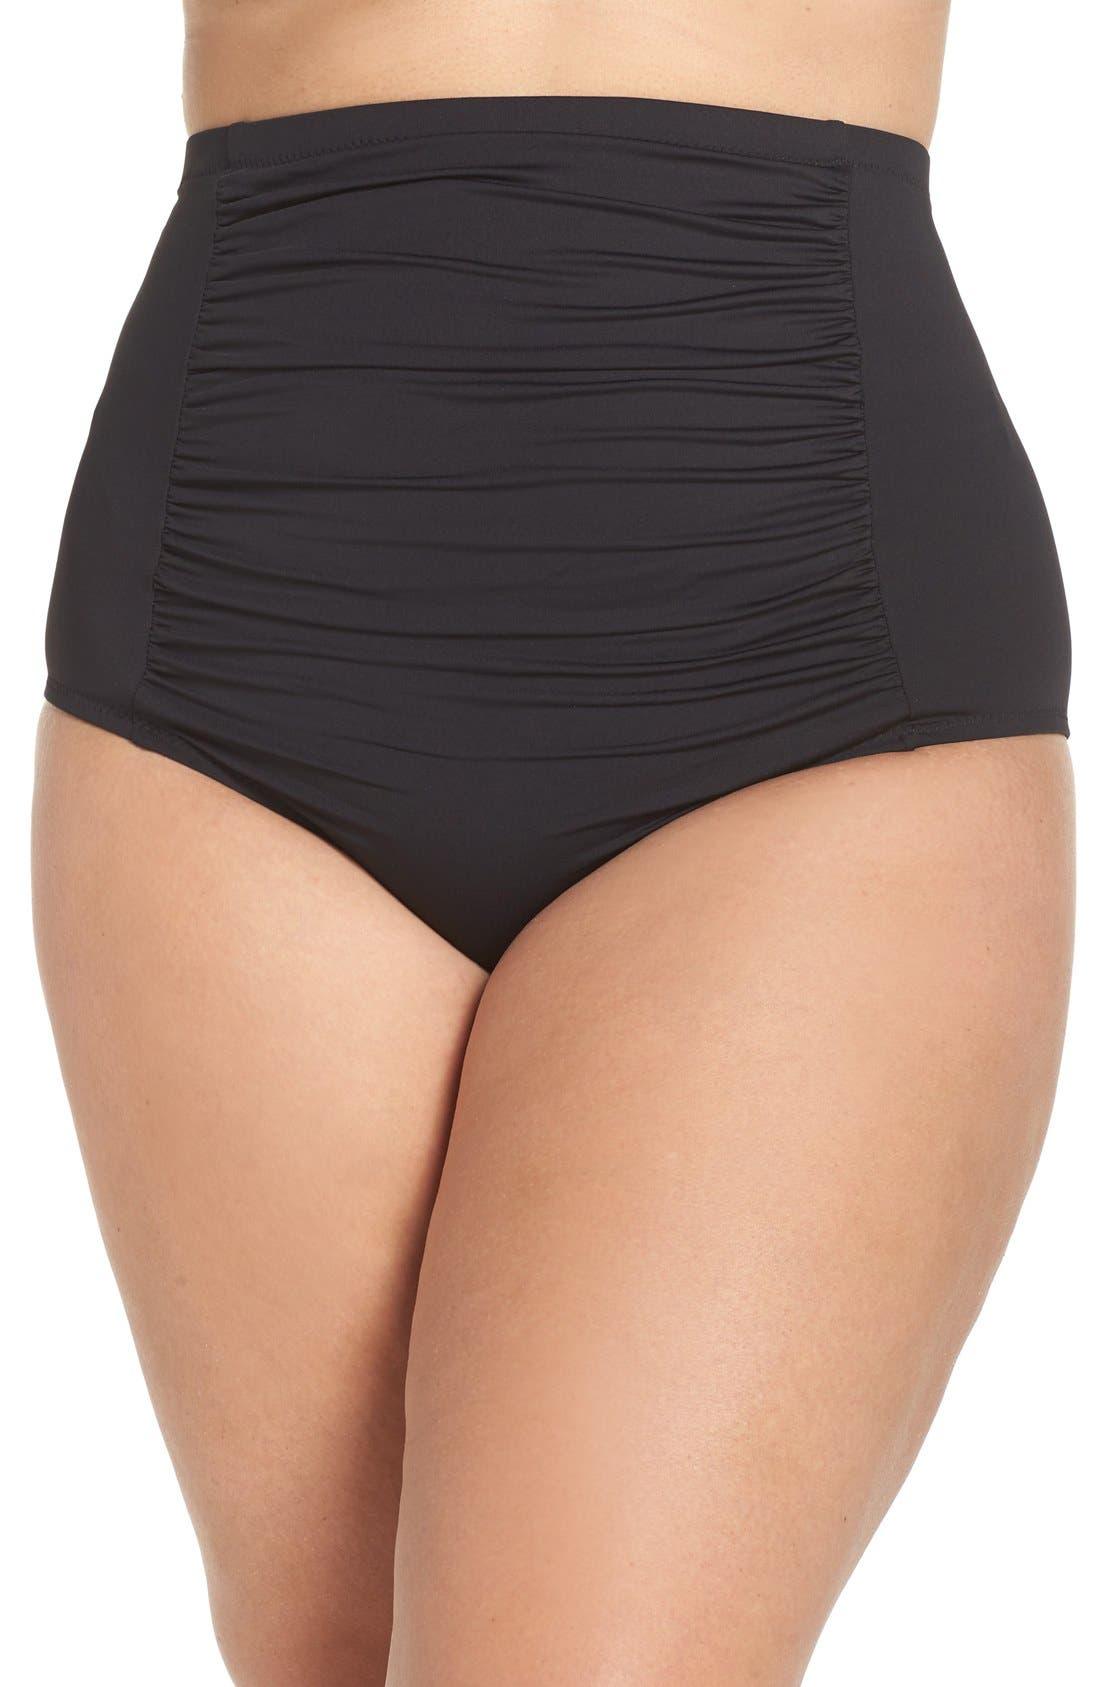 Alternate Image 1 Selected - Becca Etc. Color Code High Waist Bikini Bottoms (Plus Size)